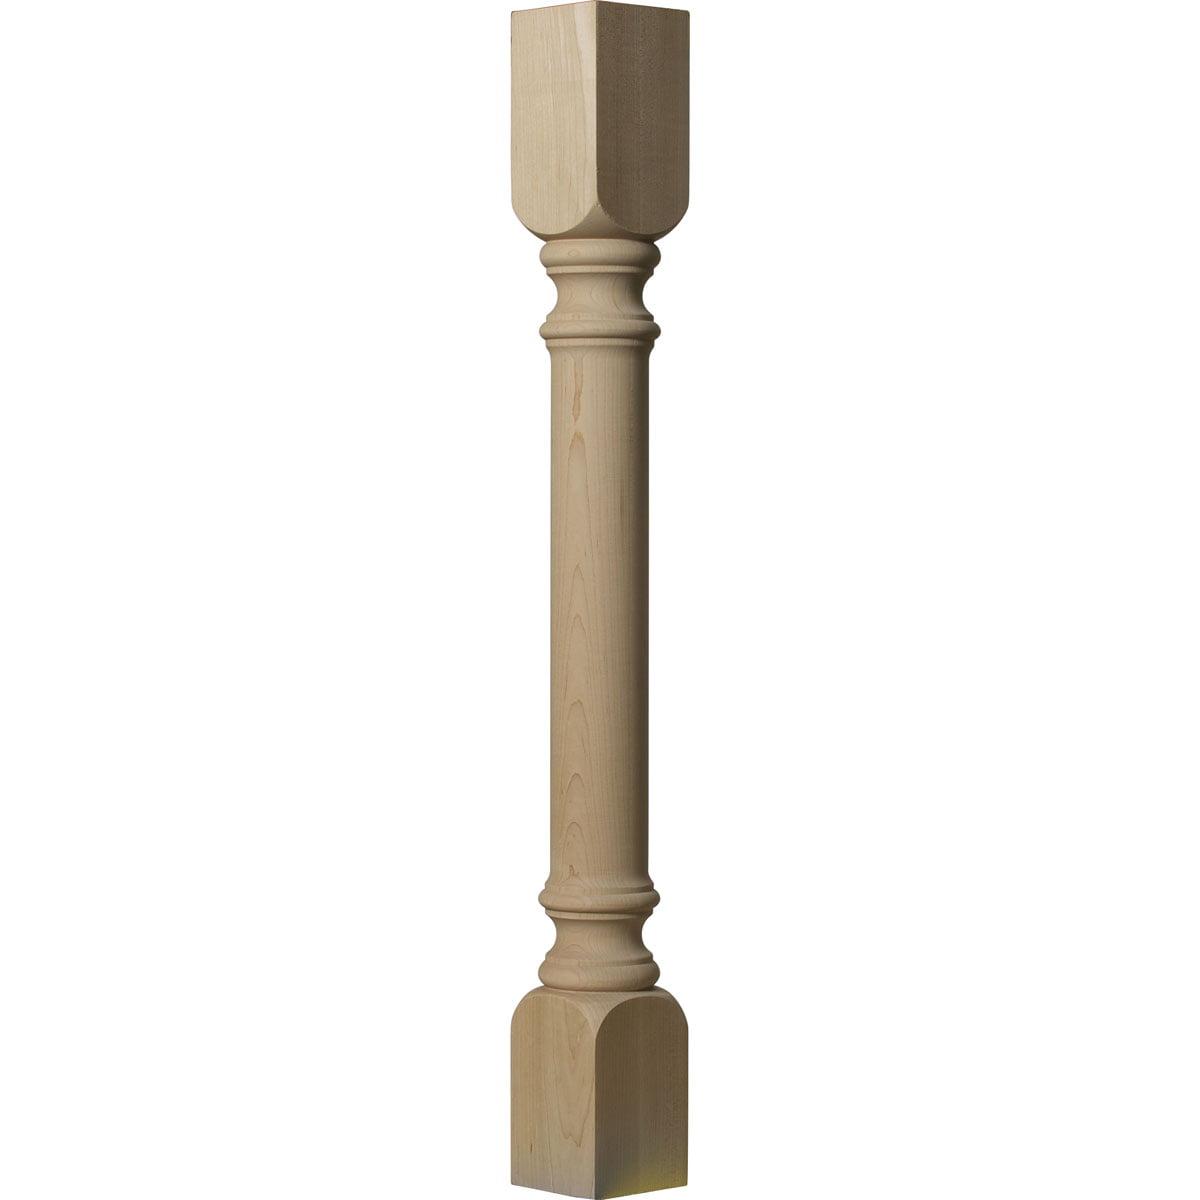 "3 3/4""W x 3 3/4""D x 35 1/2""H Traditional Cabinet Column (Top Block: 6 1/8"", Bottom Block: 7 ..."